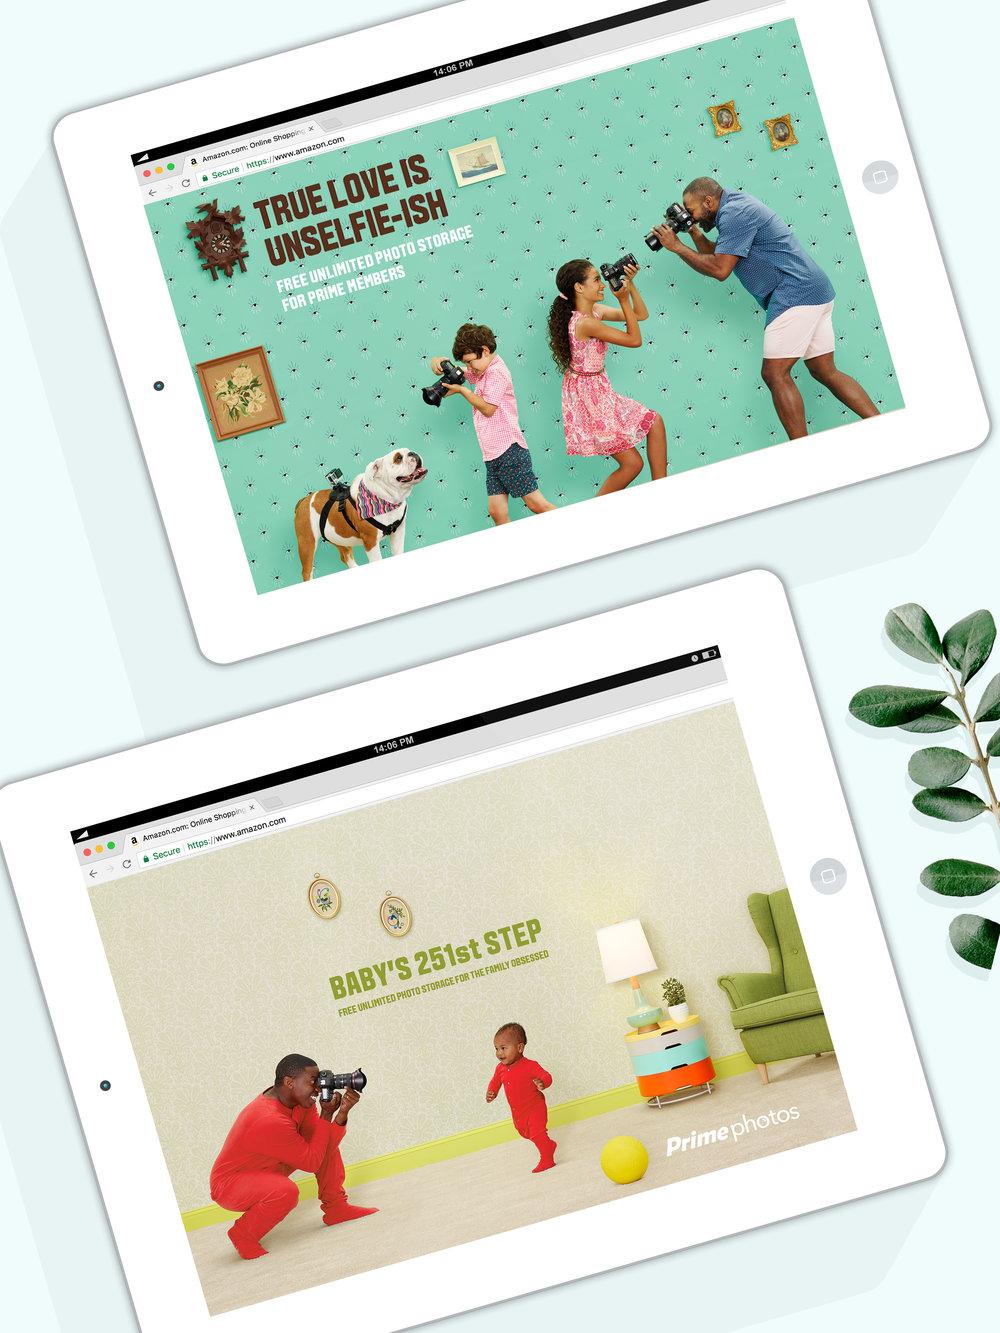 02-iPad-Landscape-Flat-Mockup.jpg